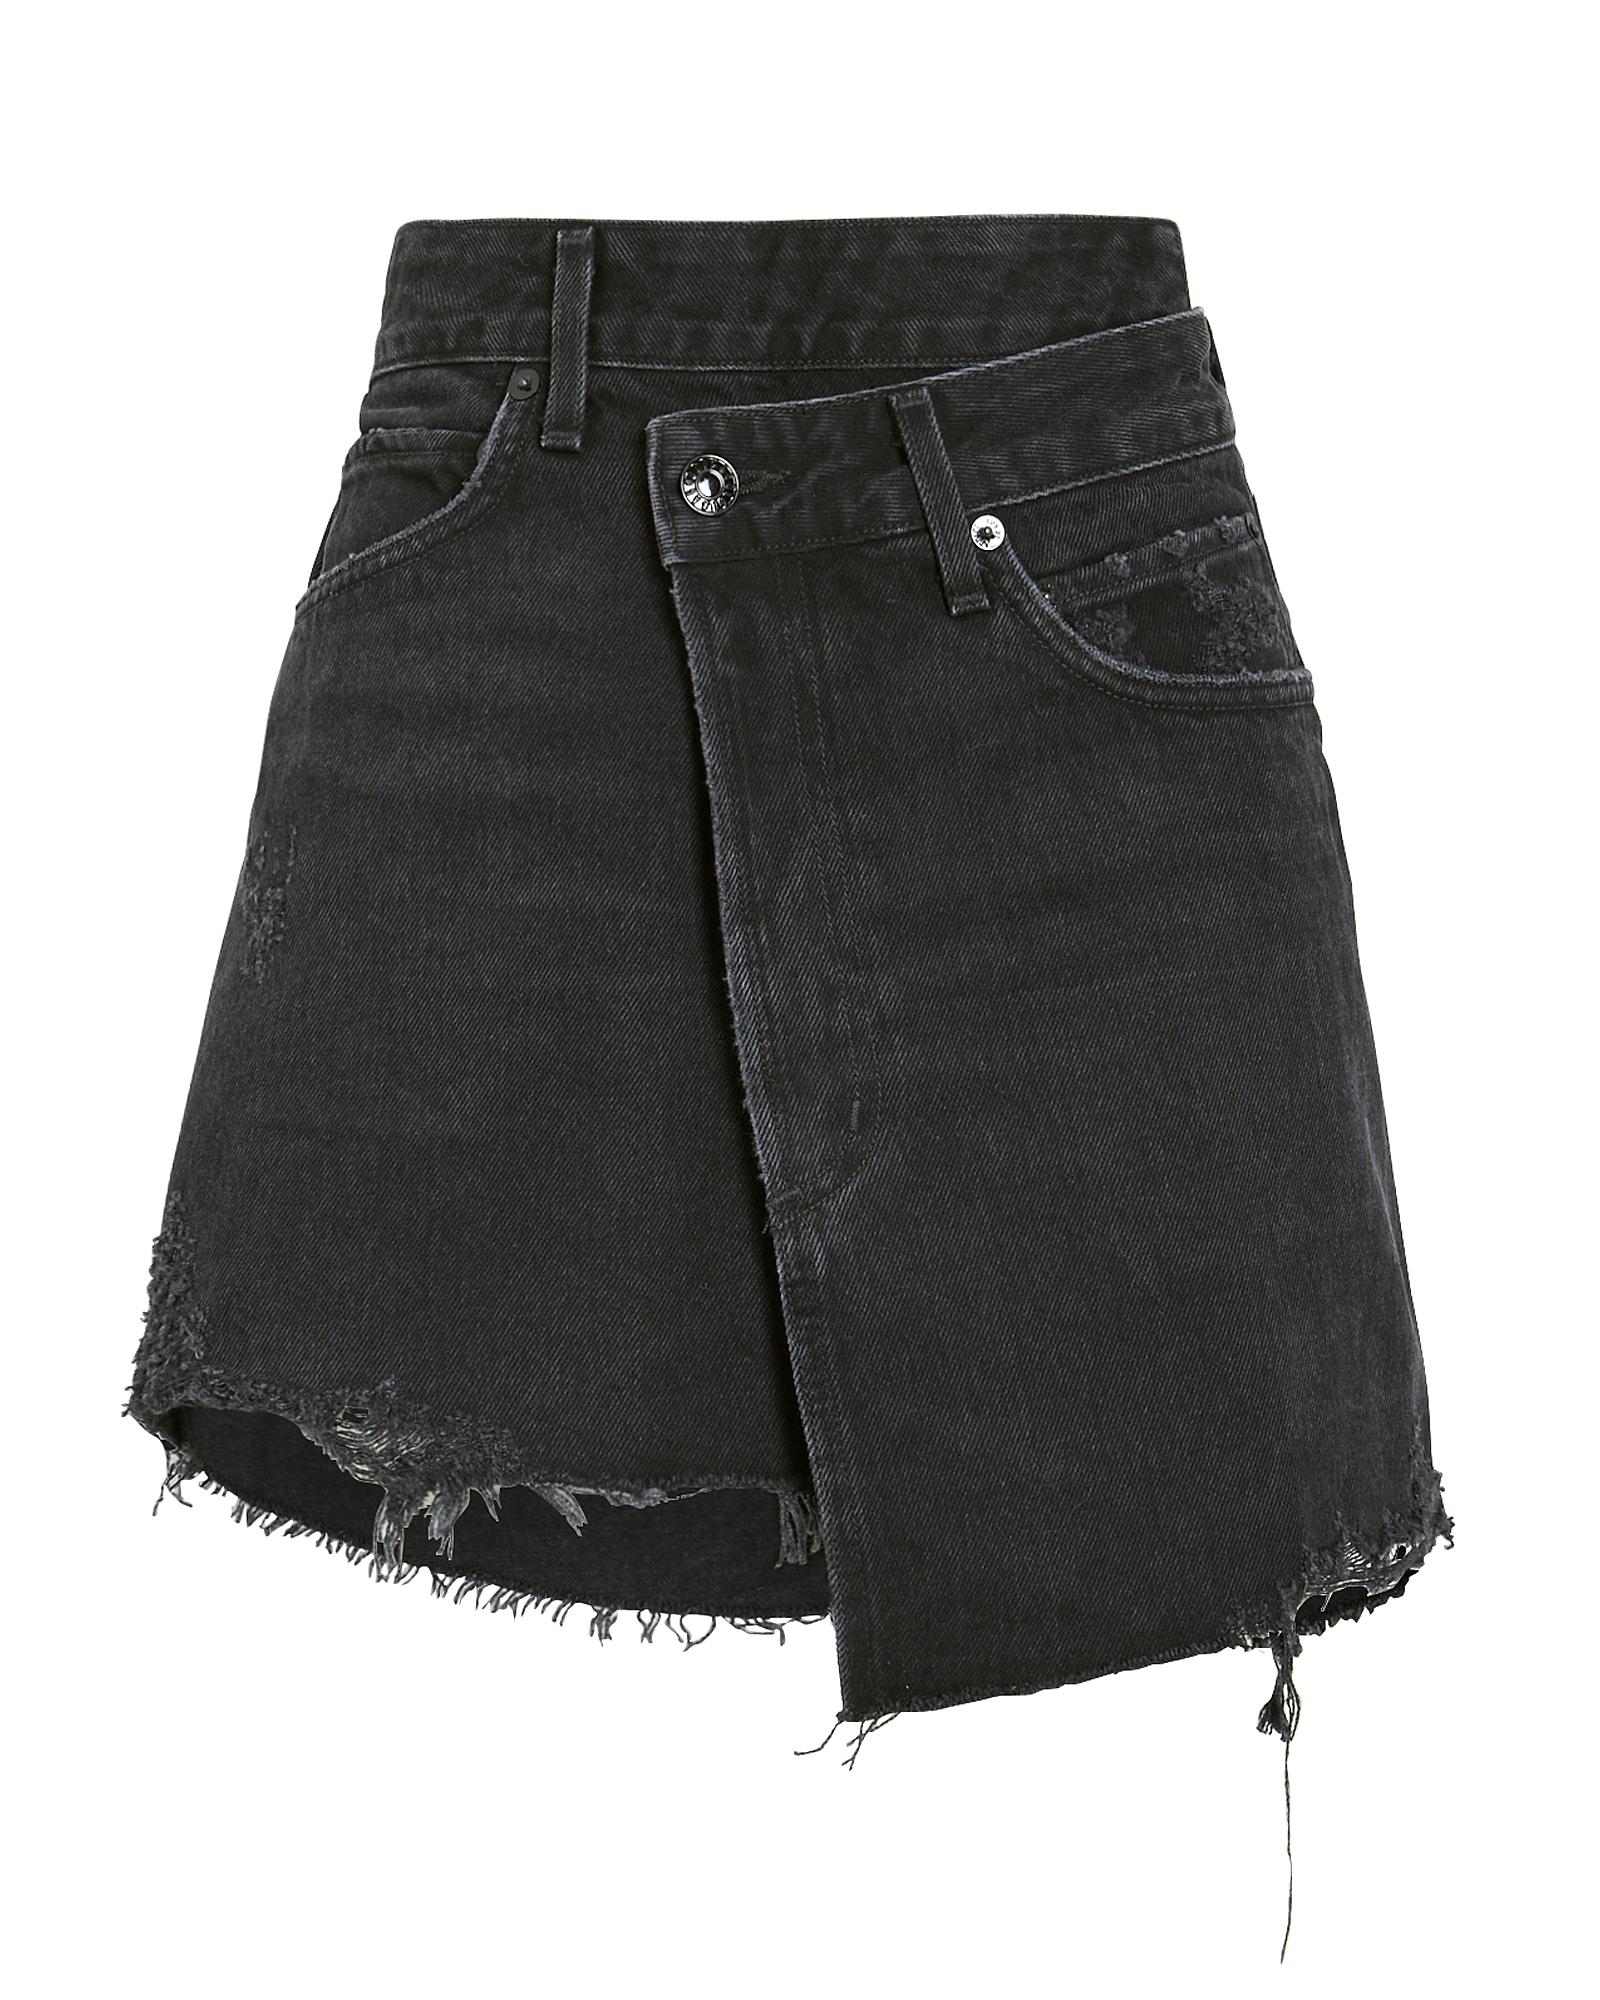 Agolde Skirts Criss Cross Denim Skirt